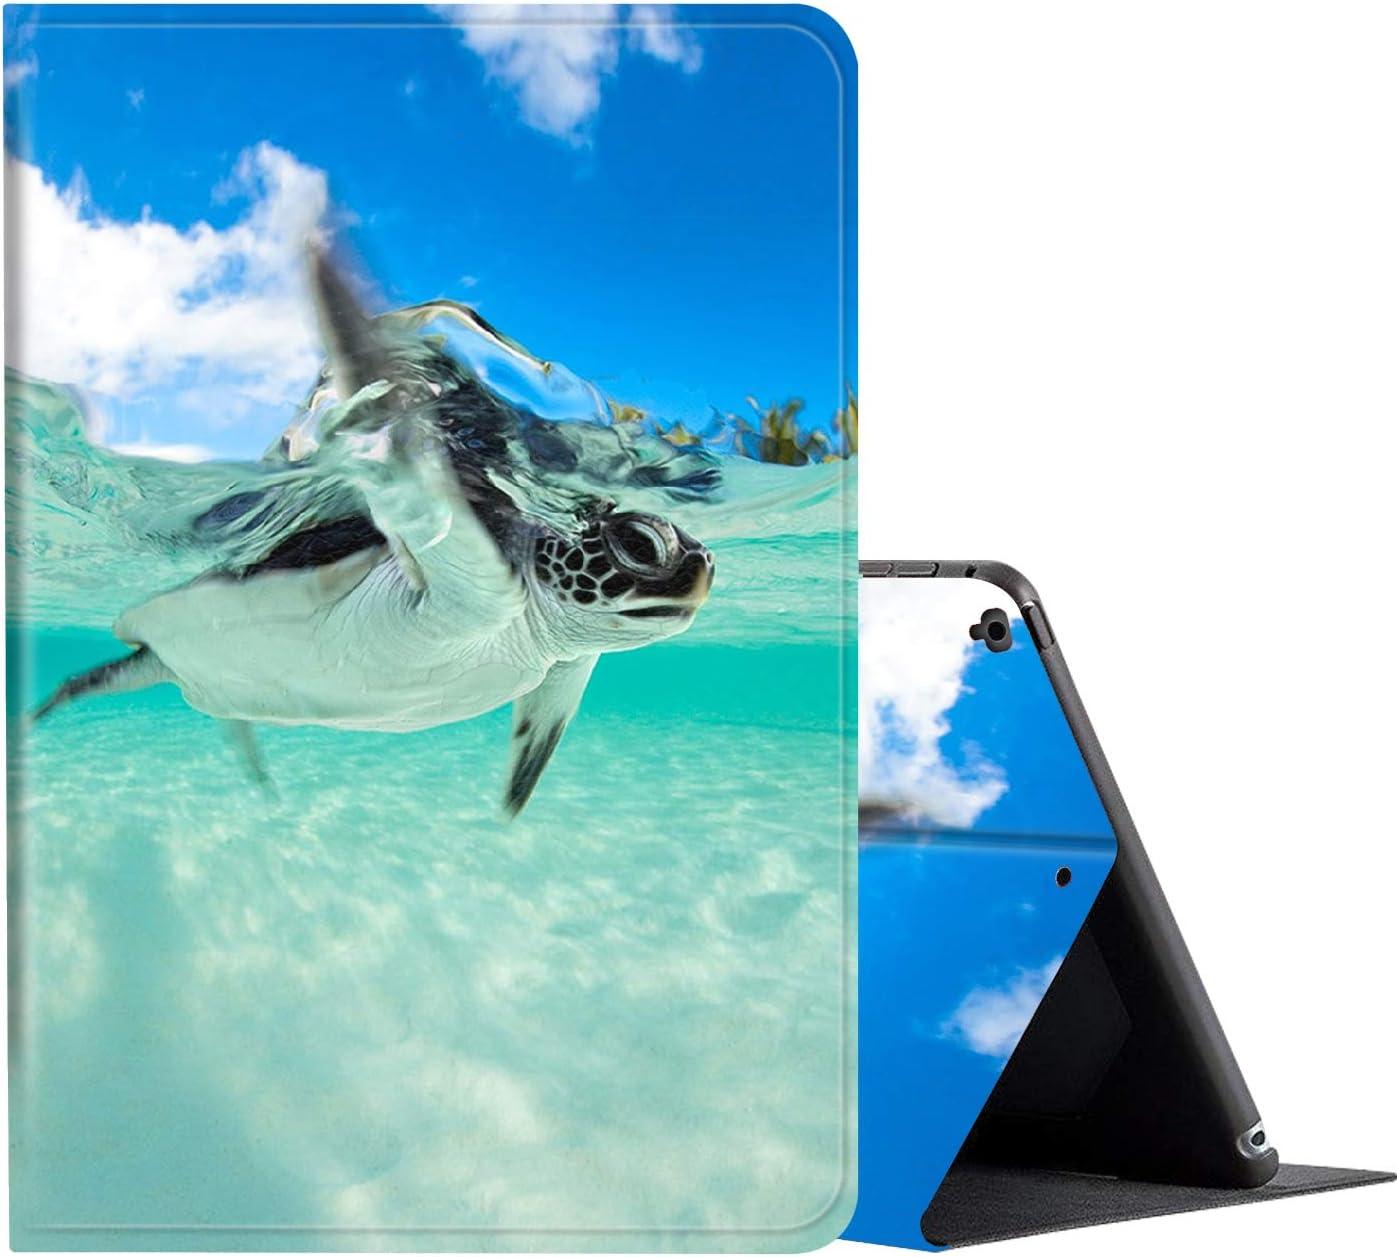 iPad 9.7 Case (2018/2017) 6th/5th Generation ipad Case,Amook Adjustable Non-Slip Folio Stand with Auto Wake/Sleep Smart Cover for Apple iPad 6/5 Gen & ipad air 1/2 9.7 inch-Baby Sea Turtle Swimming